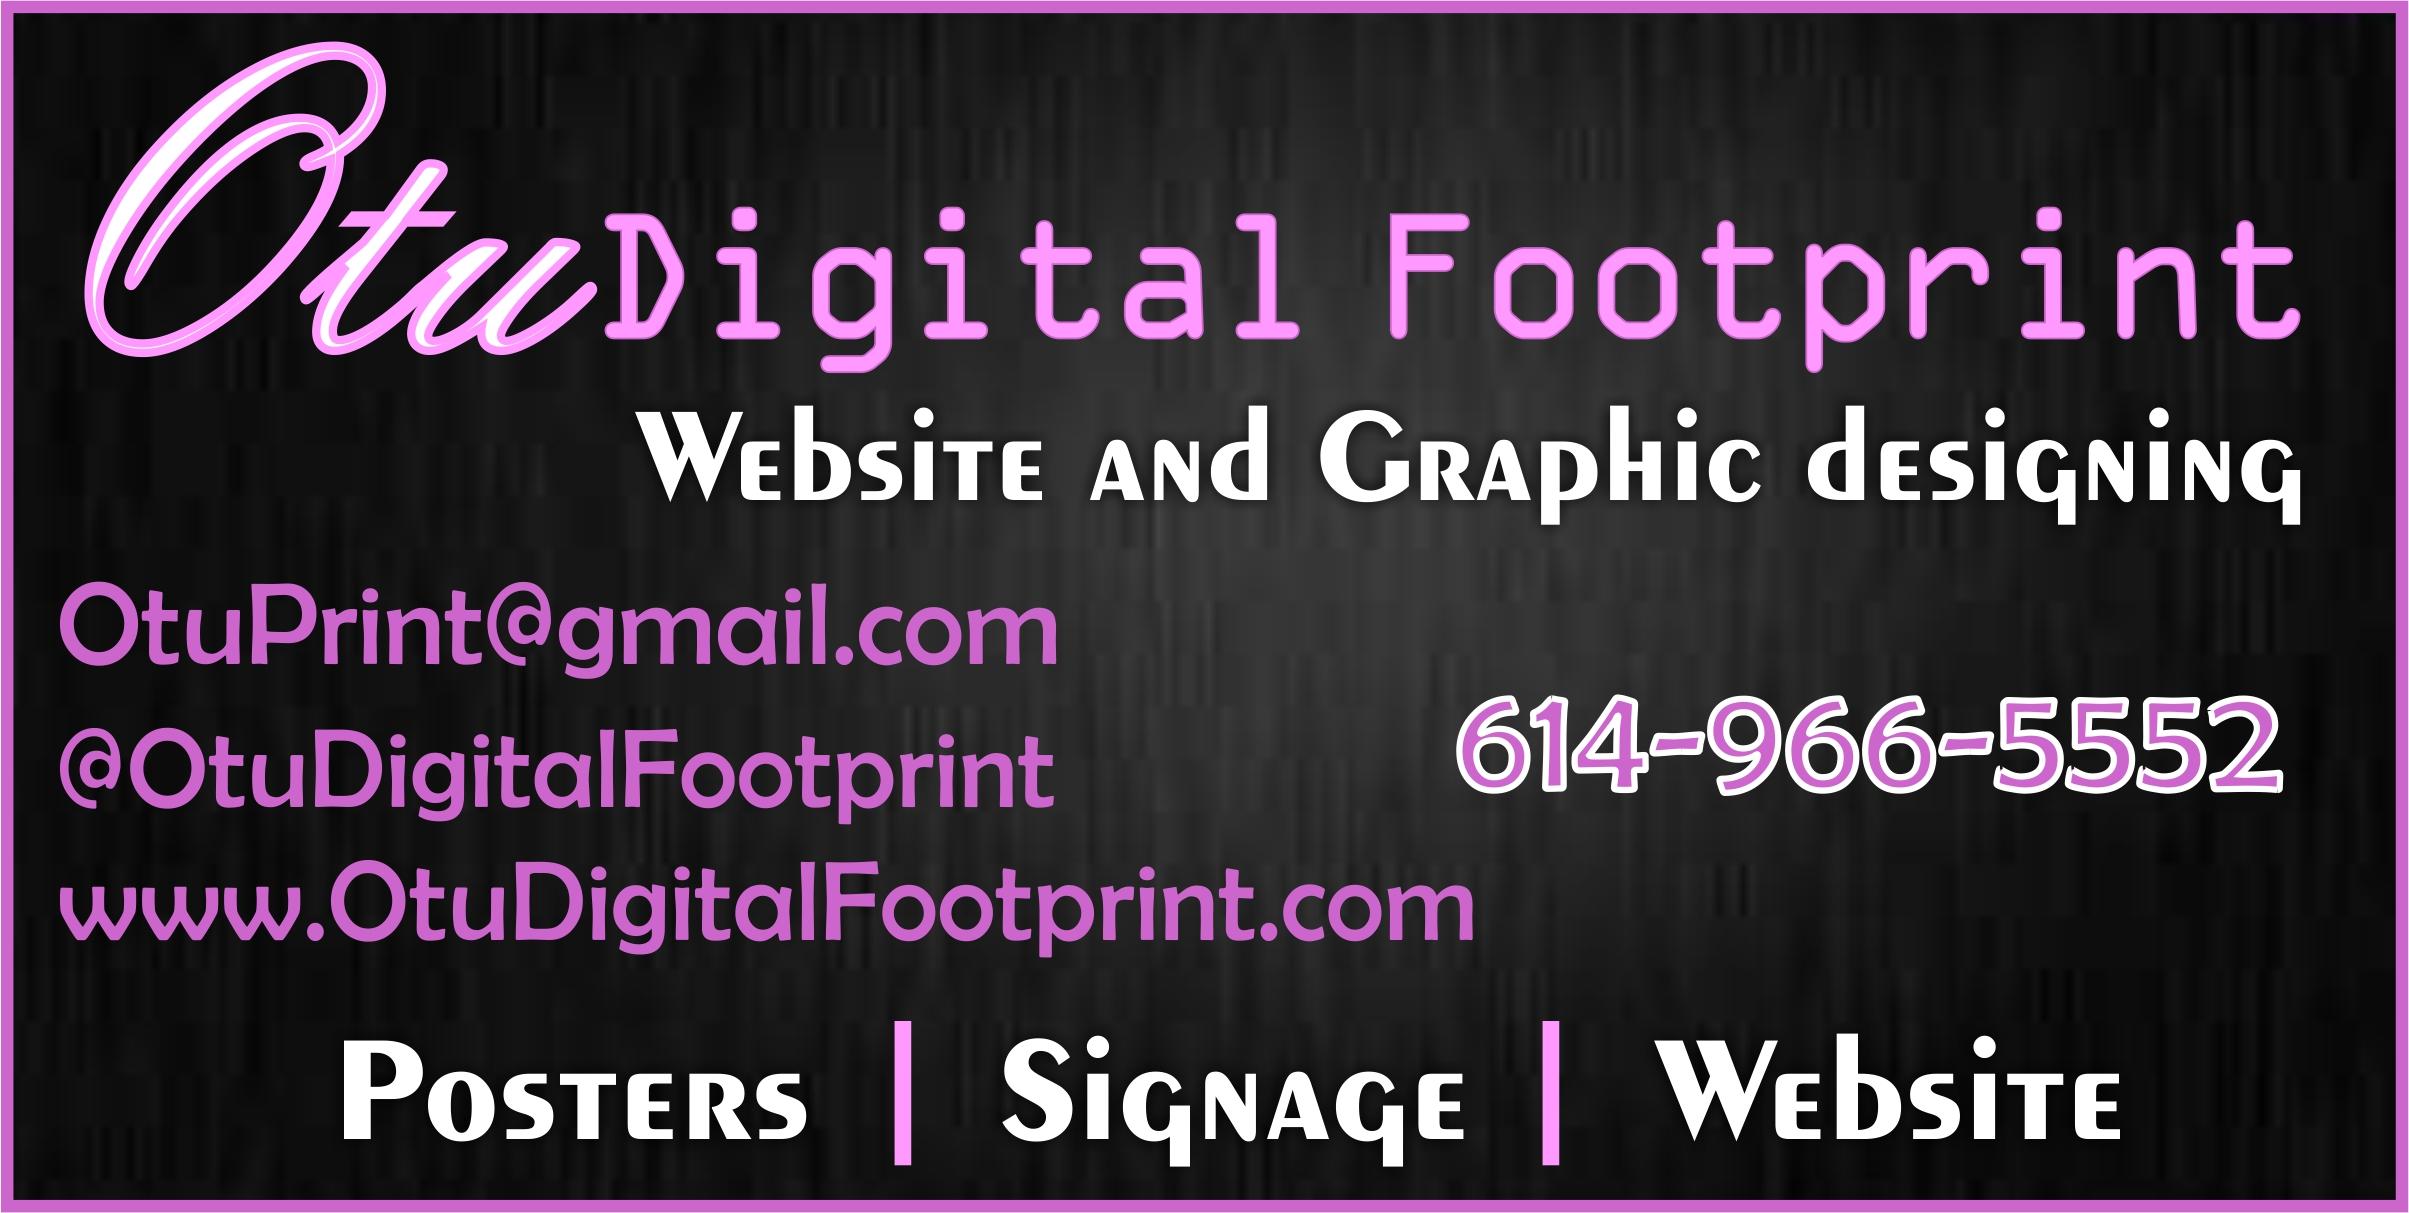 OtuDigital Footprint